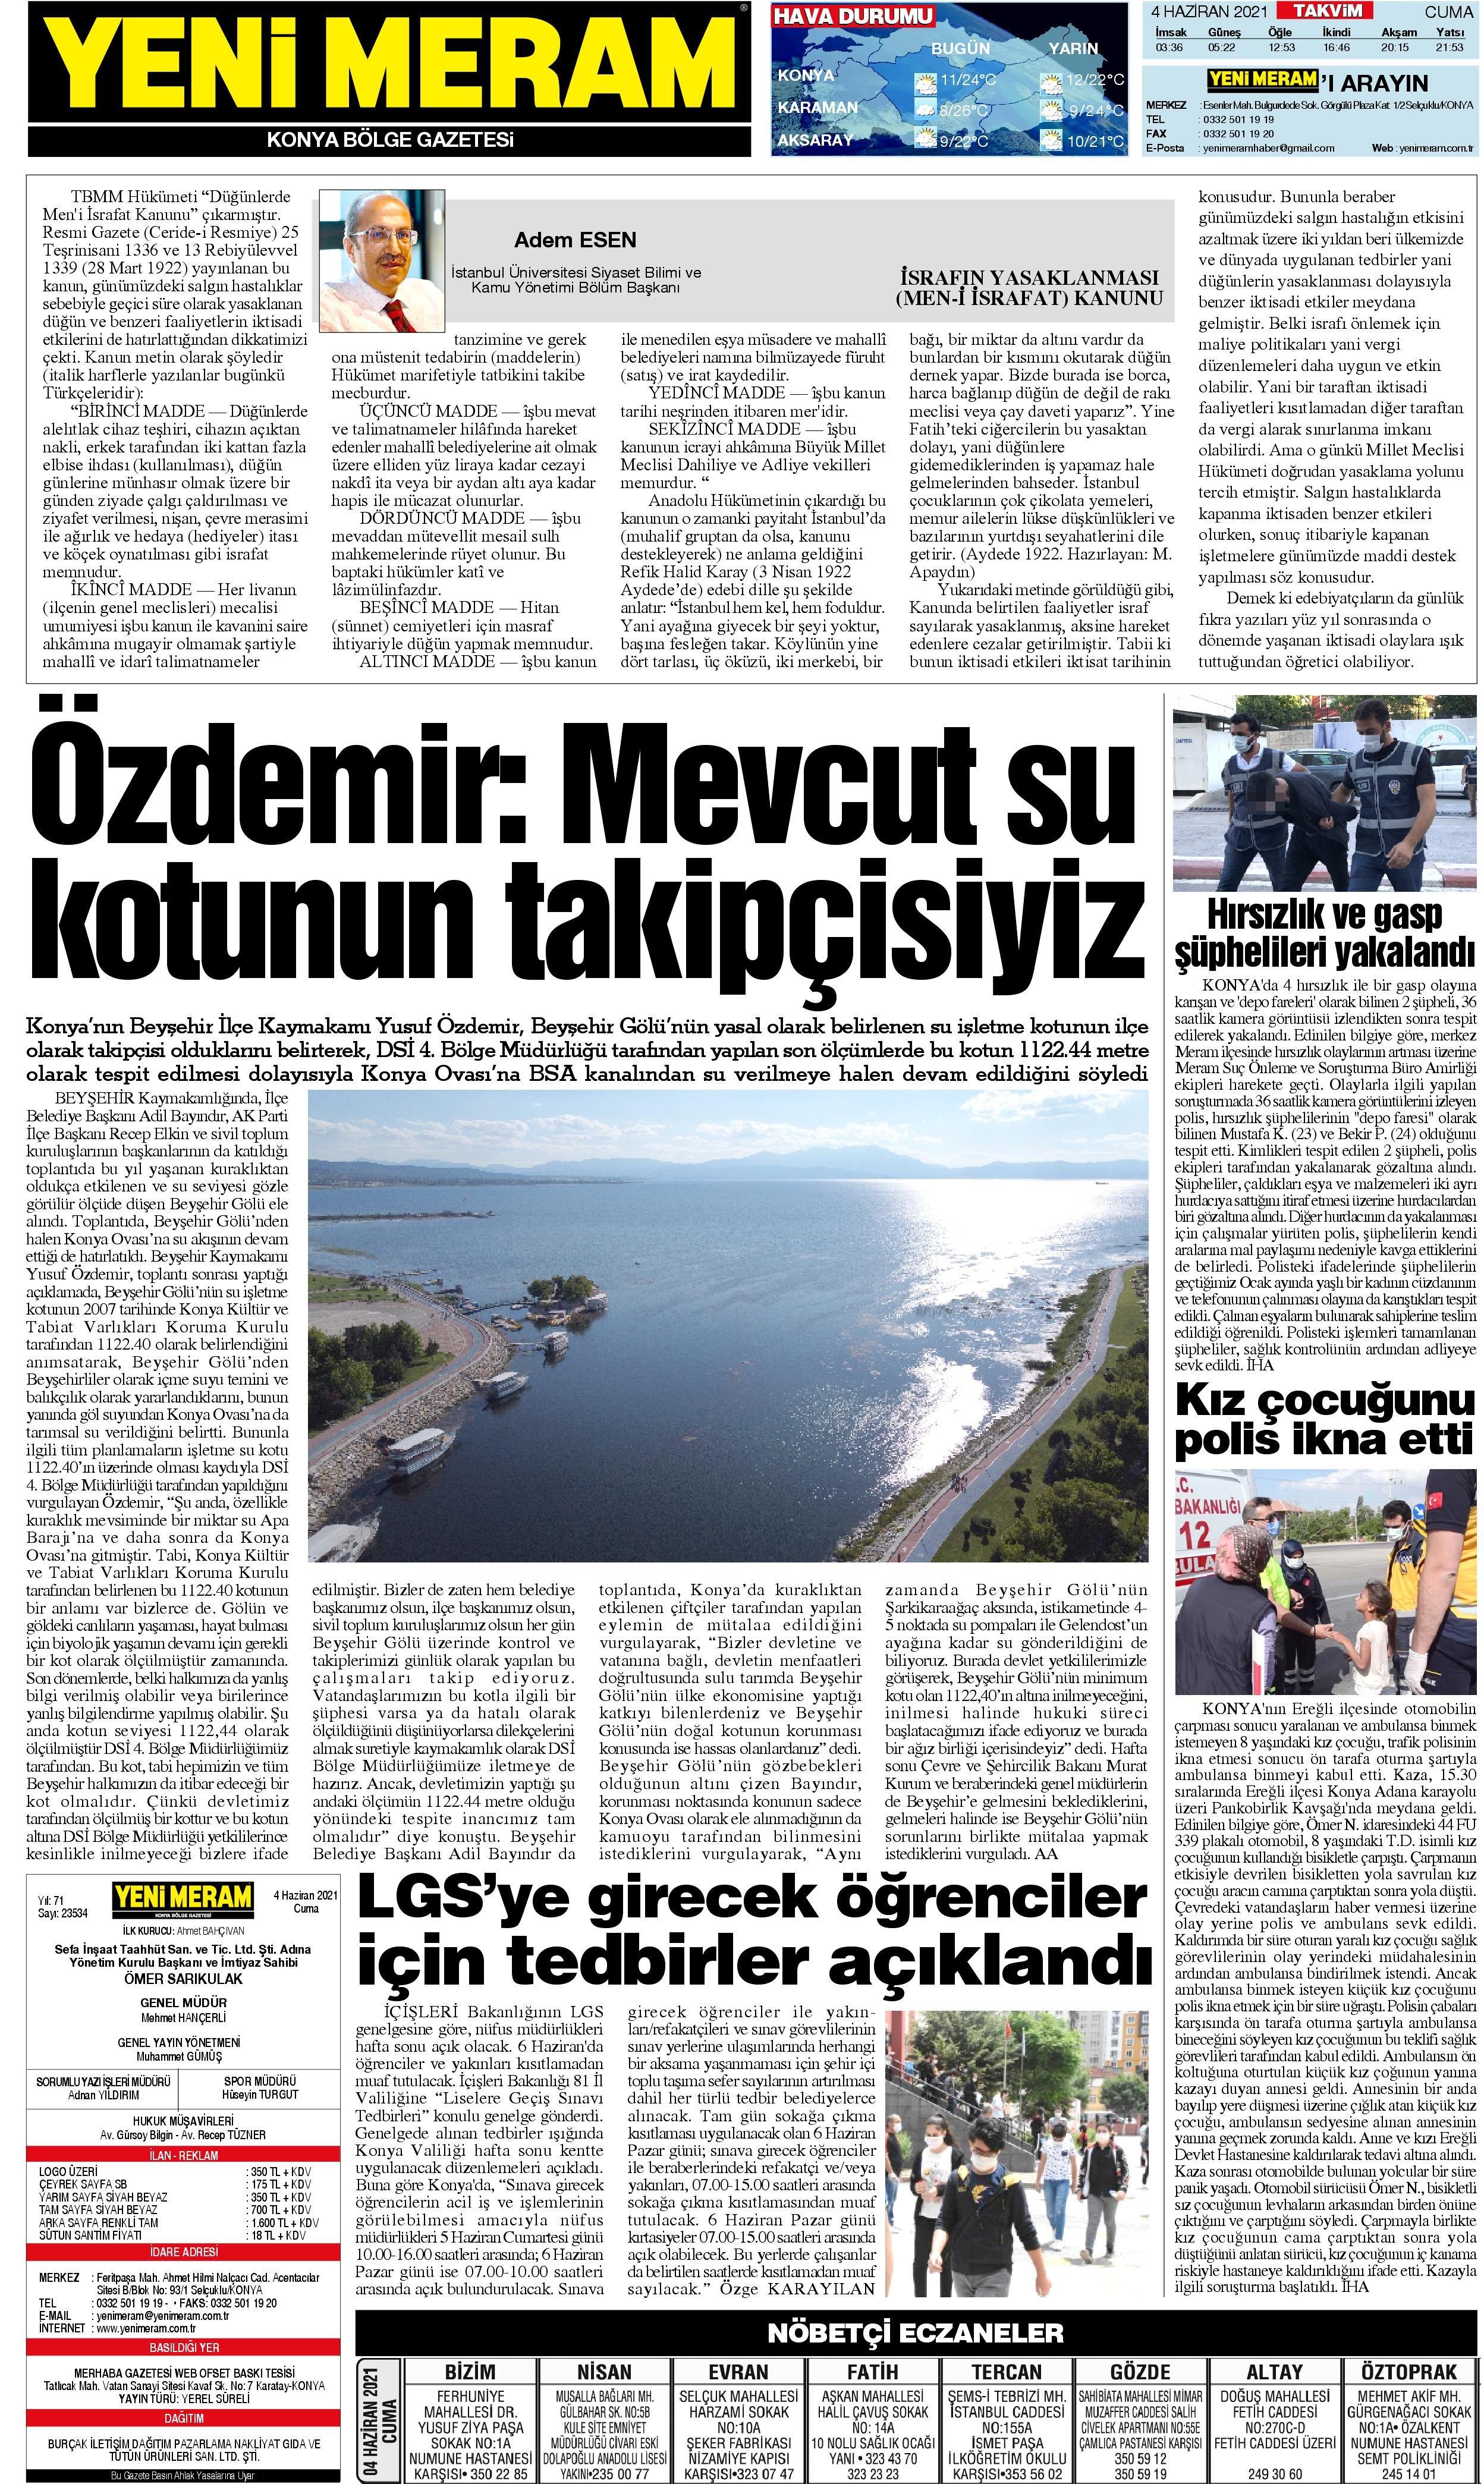 4 Haziran 2021 Yeni Meram Gazetesi